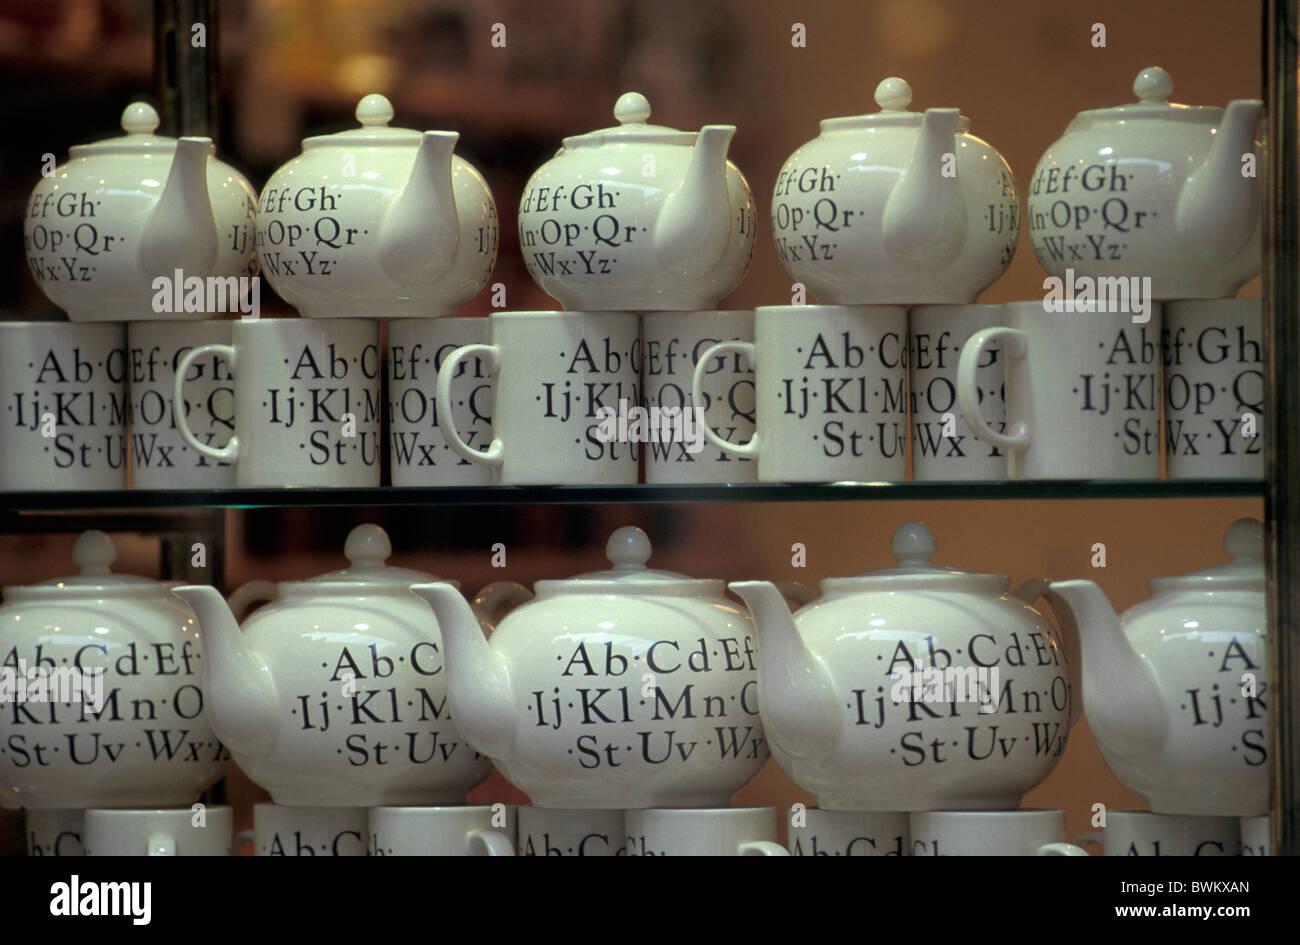 UK London Shop window Whittard Tea's Carnaby Street Mayfair Great Britain Europe England ceramics pots mugs - Stock Image